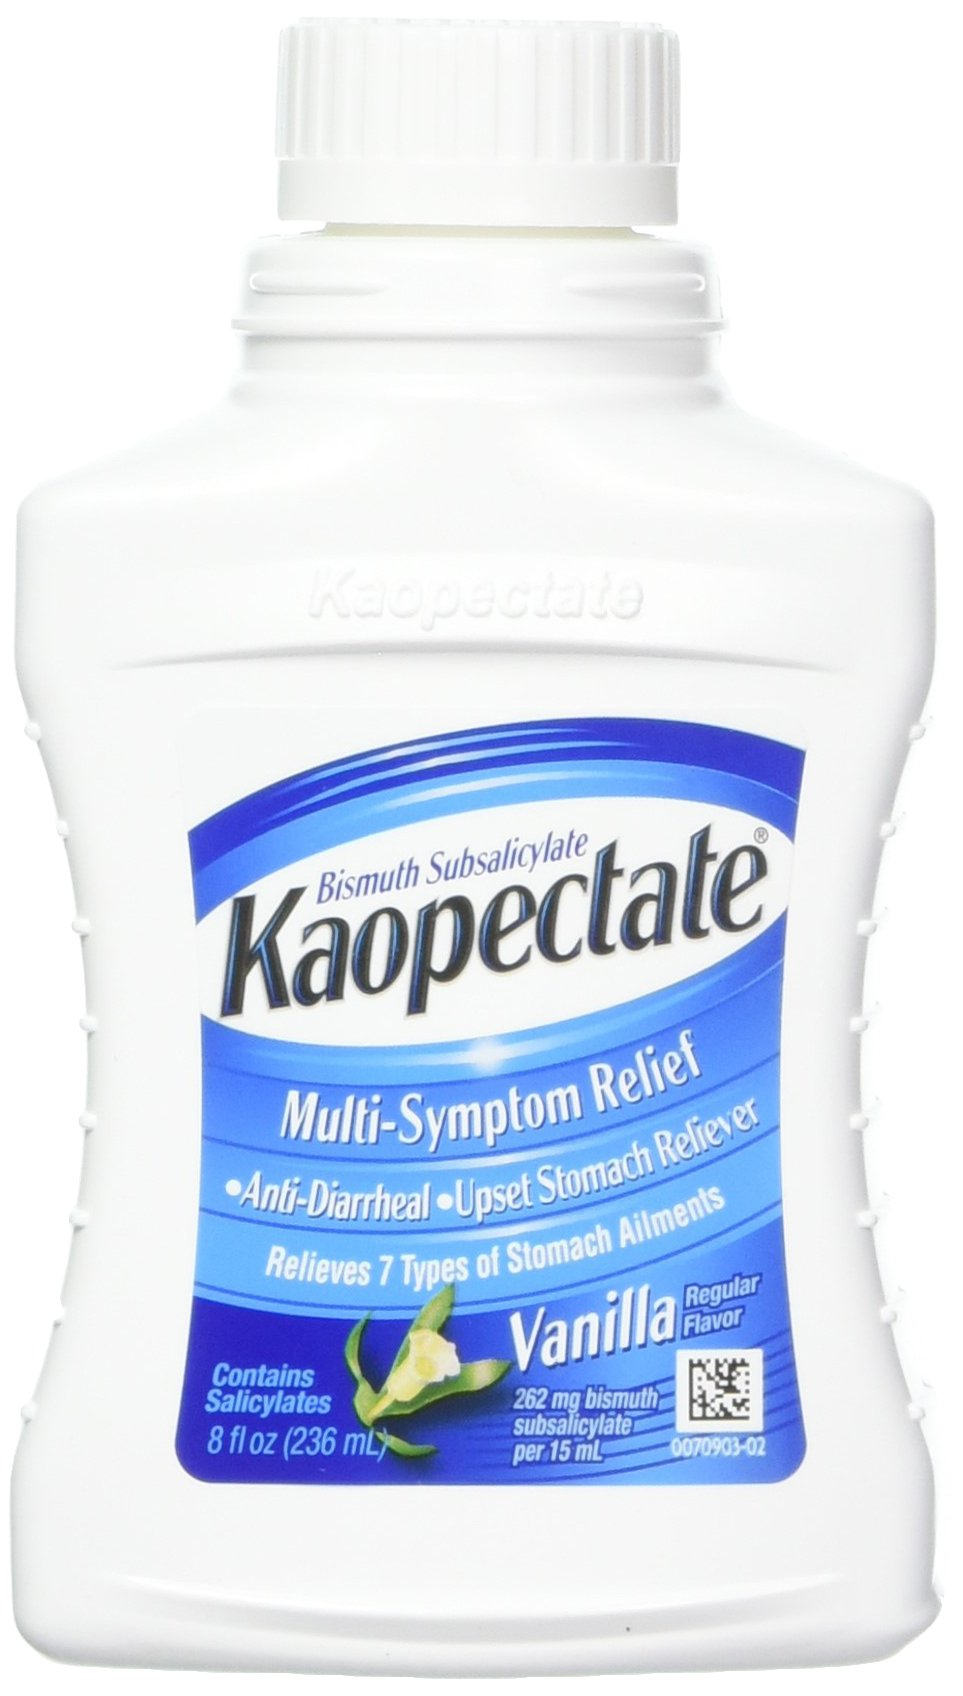 Kaopectate Multi-Symptom Relief Anti-Diarrheal/Upset Stomach Reliever Liquid, Vanilla 8 oz (Pack of 3) by Kaopectate